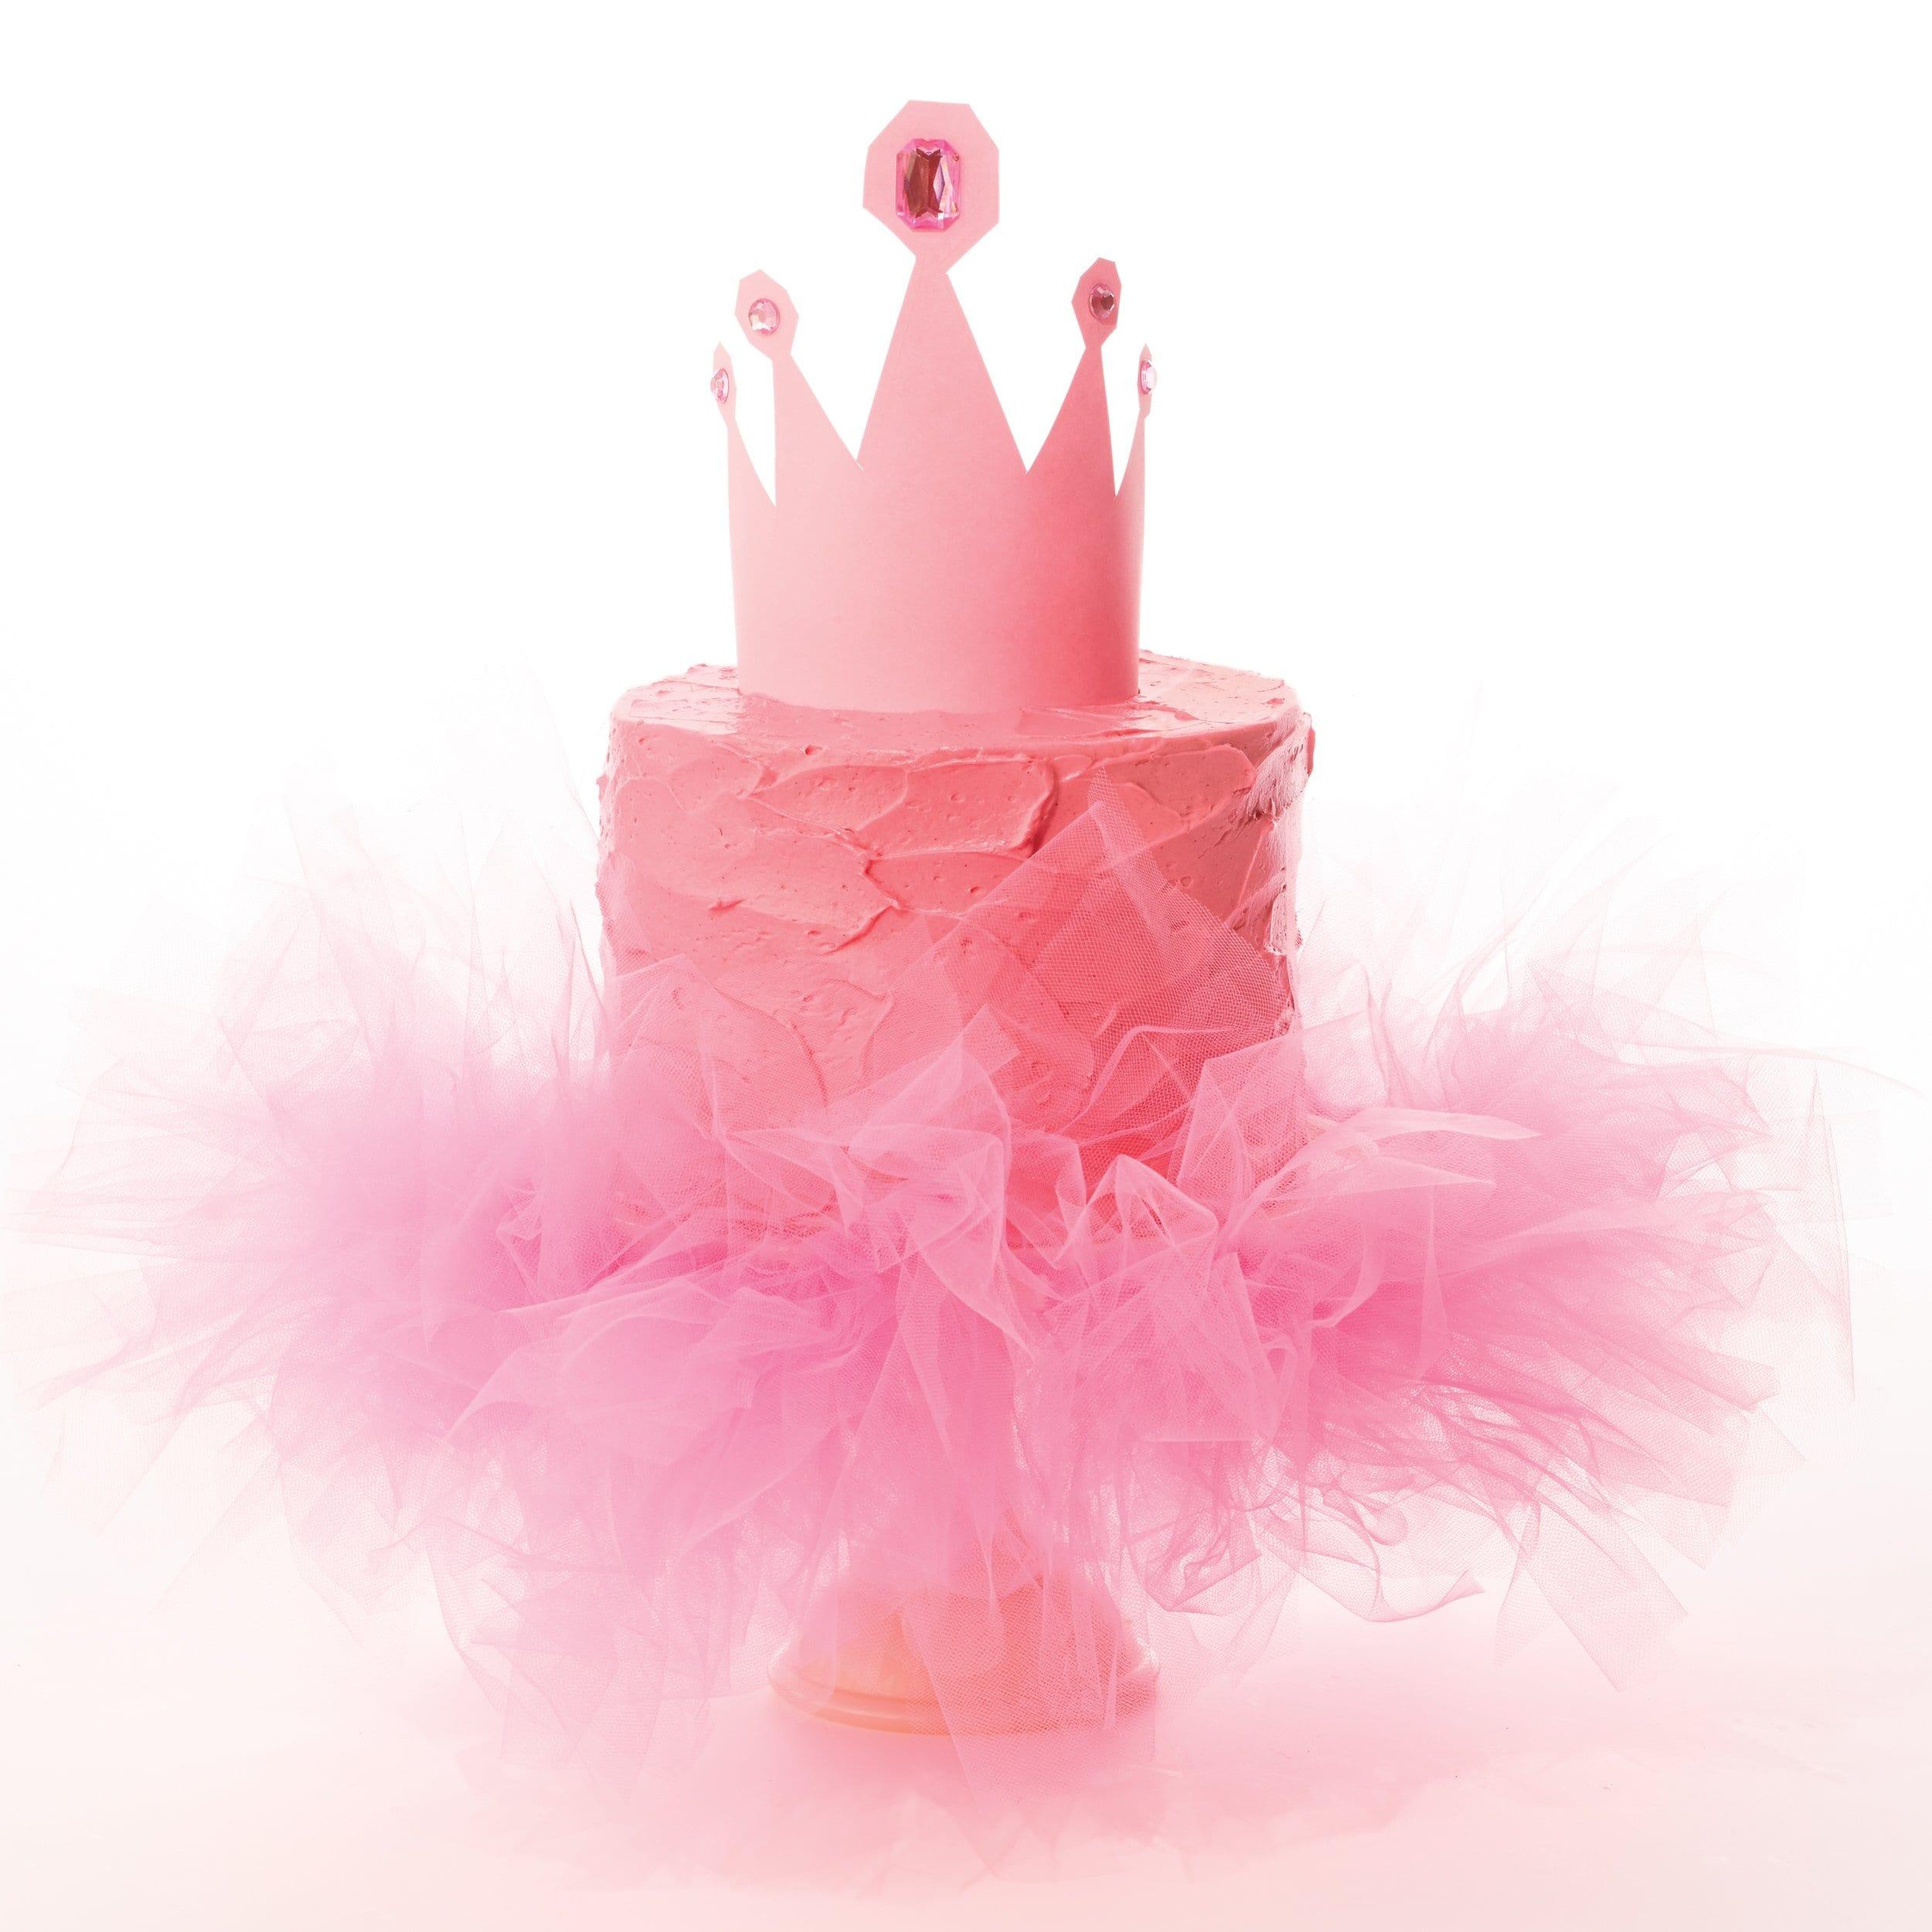 gymn-s18_cakes_pricesscake_0517